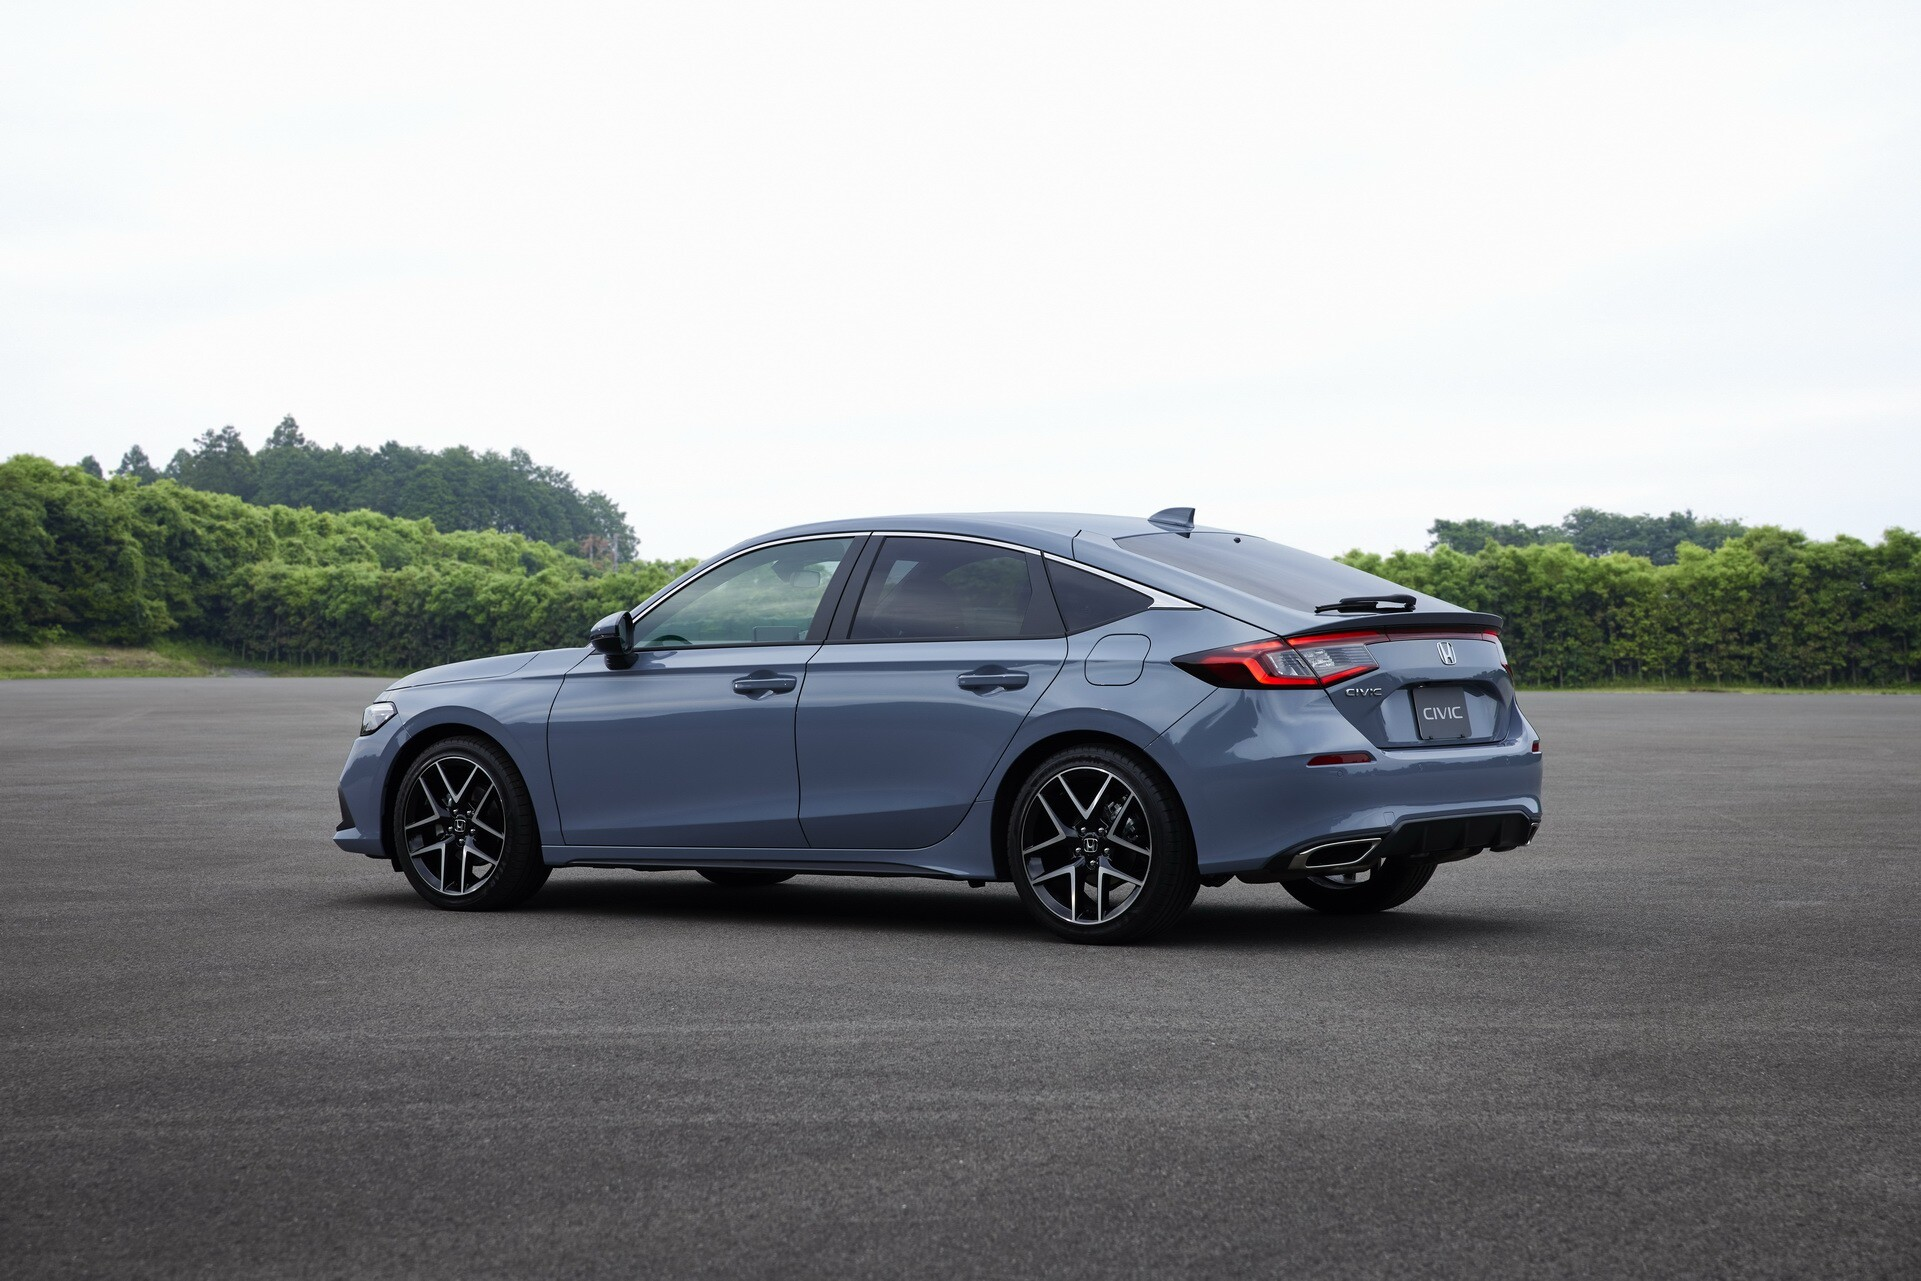 Foto de Honda Civic Hatchback 2022 (10/18)